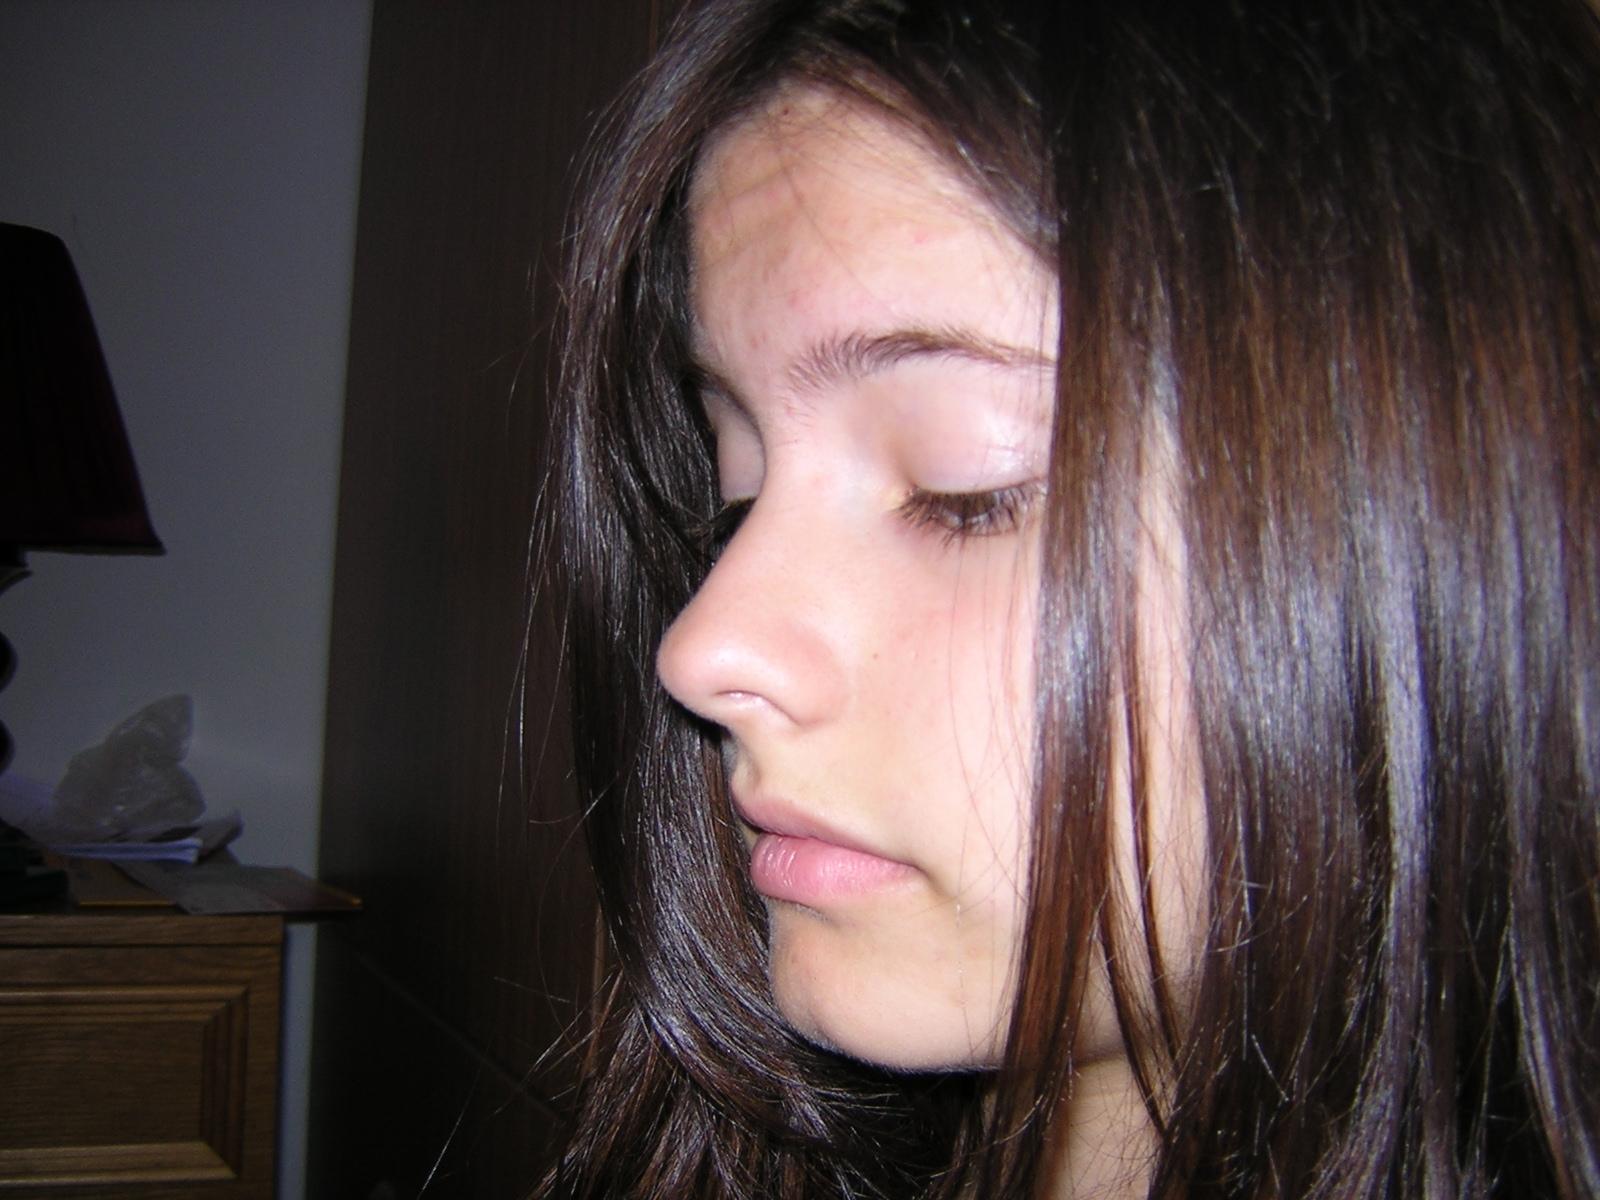 Фотографии из контакта девушки 9 фотография